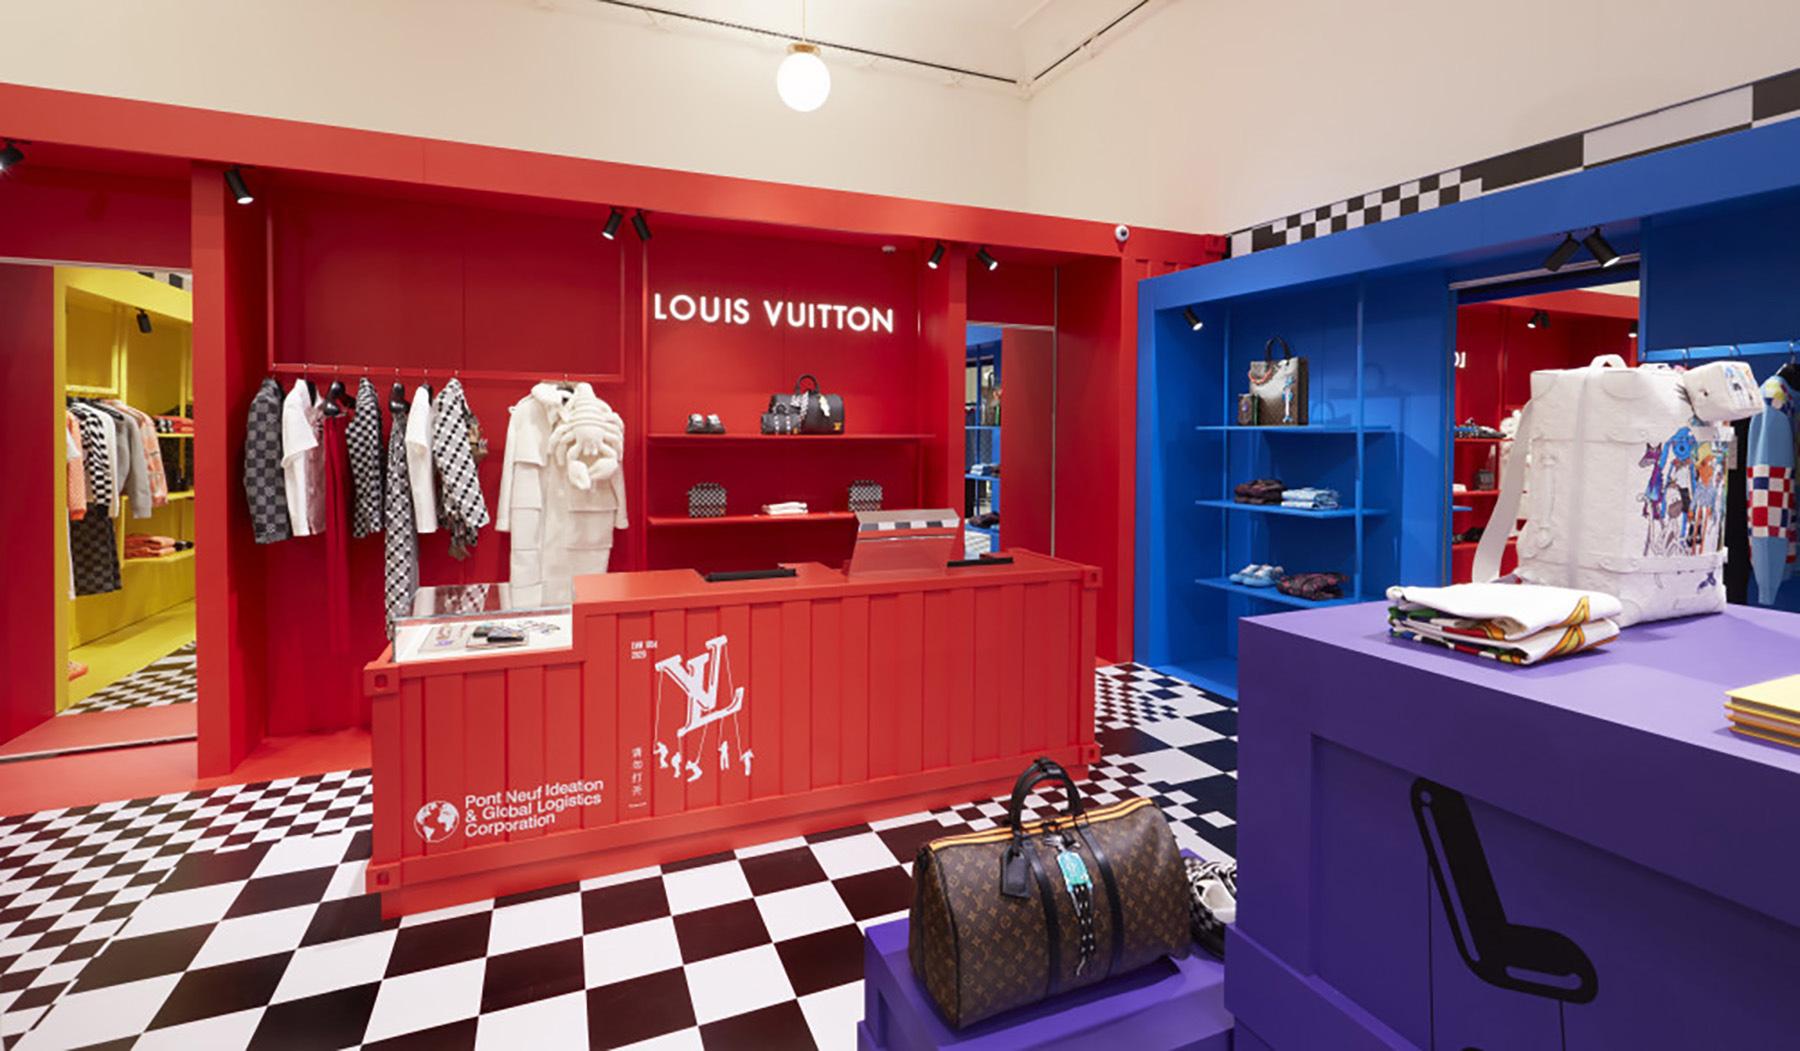 Louis Vuitton's Virtual London Pop-Up